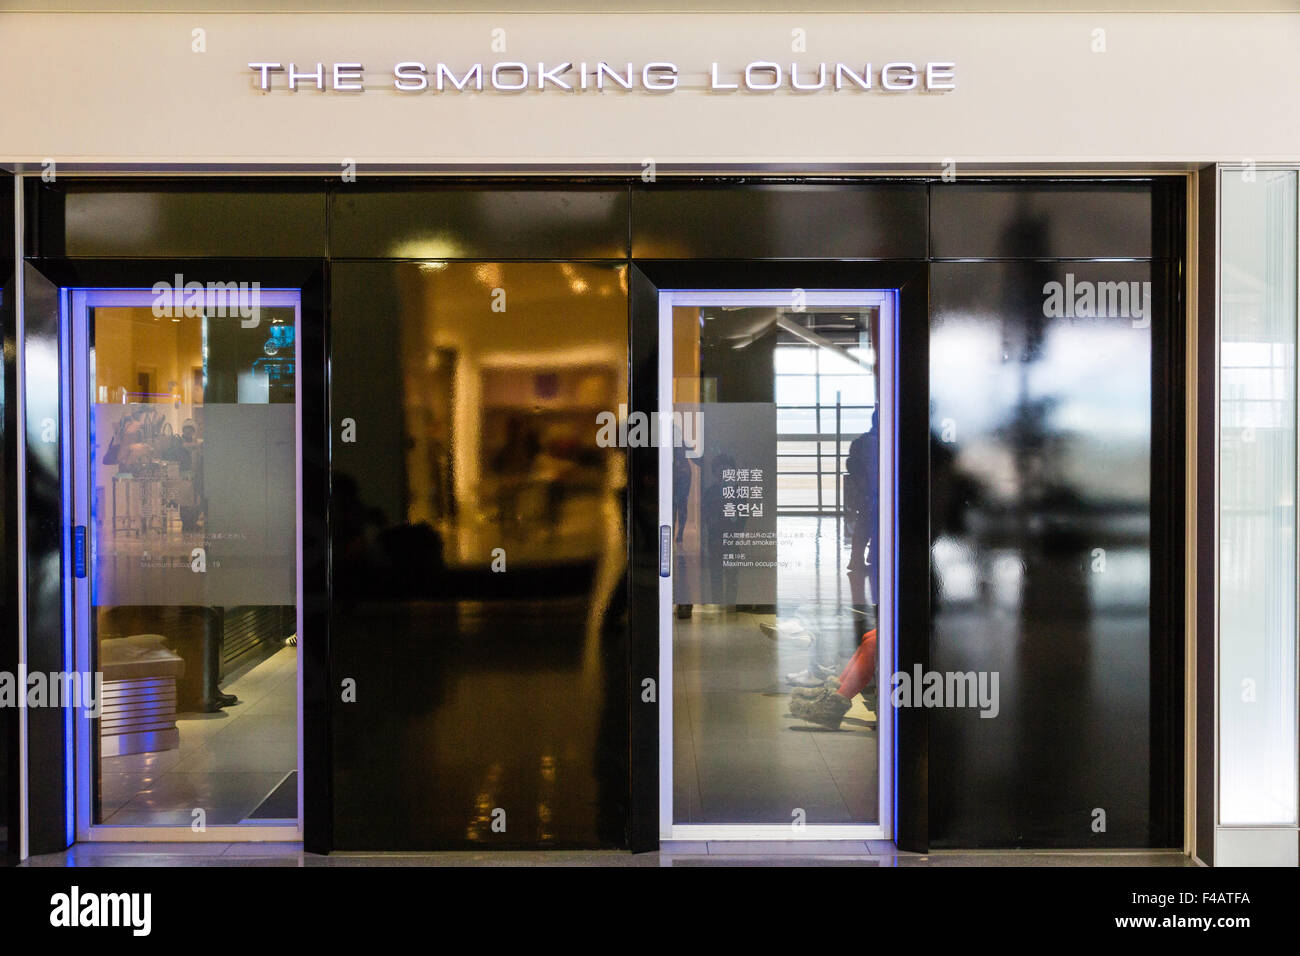 Sala Fumatori Aeroporto Palermo : Smoking booth immagini & smoking booth fotos stock alamy